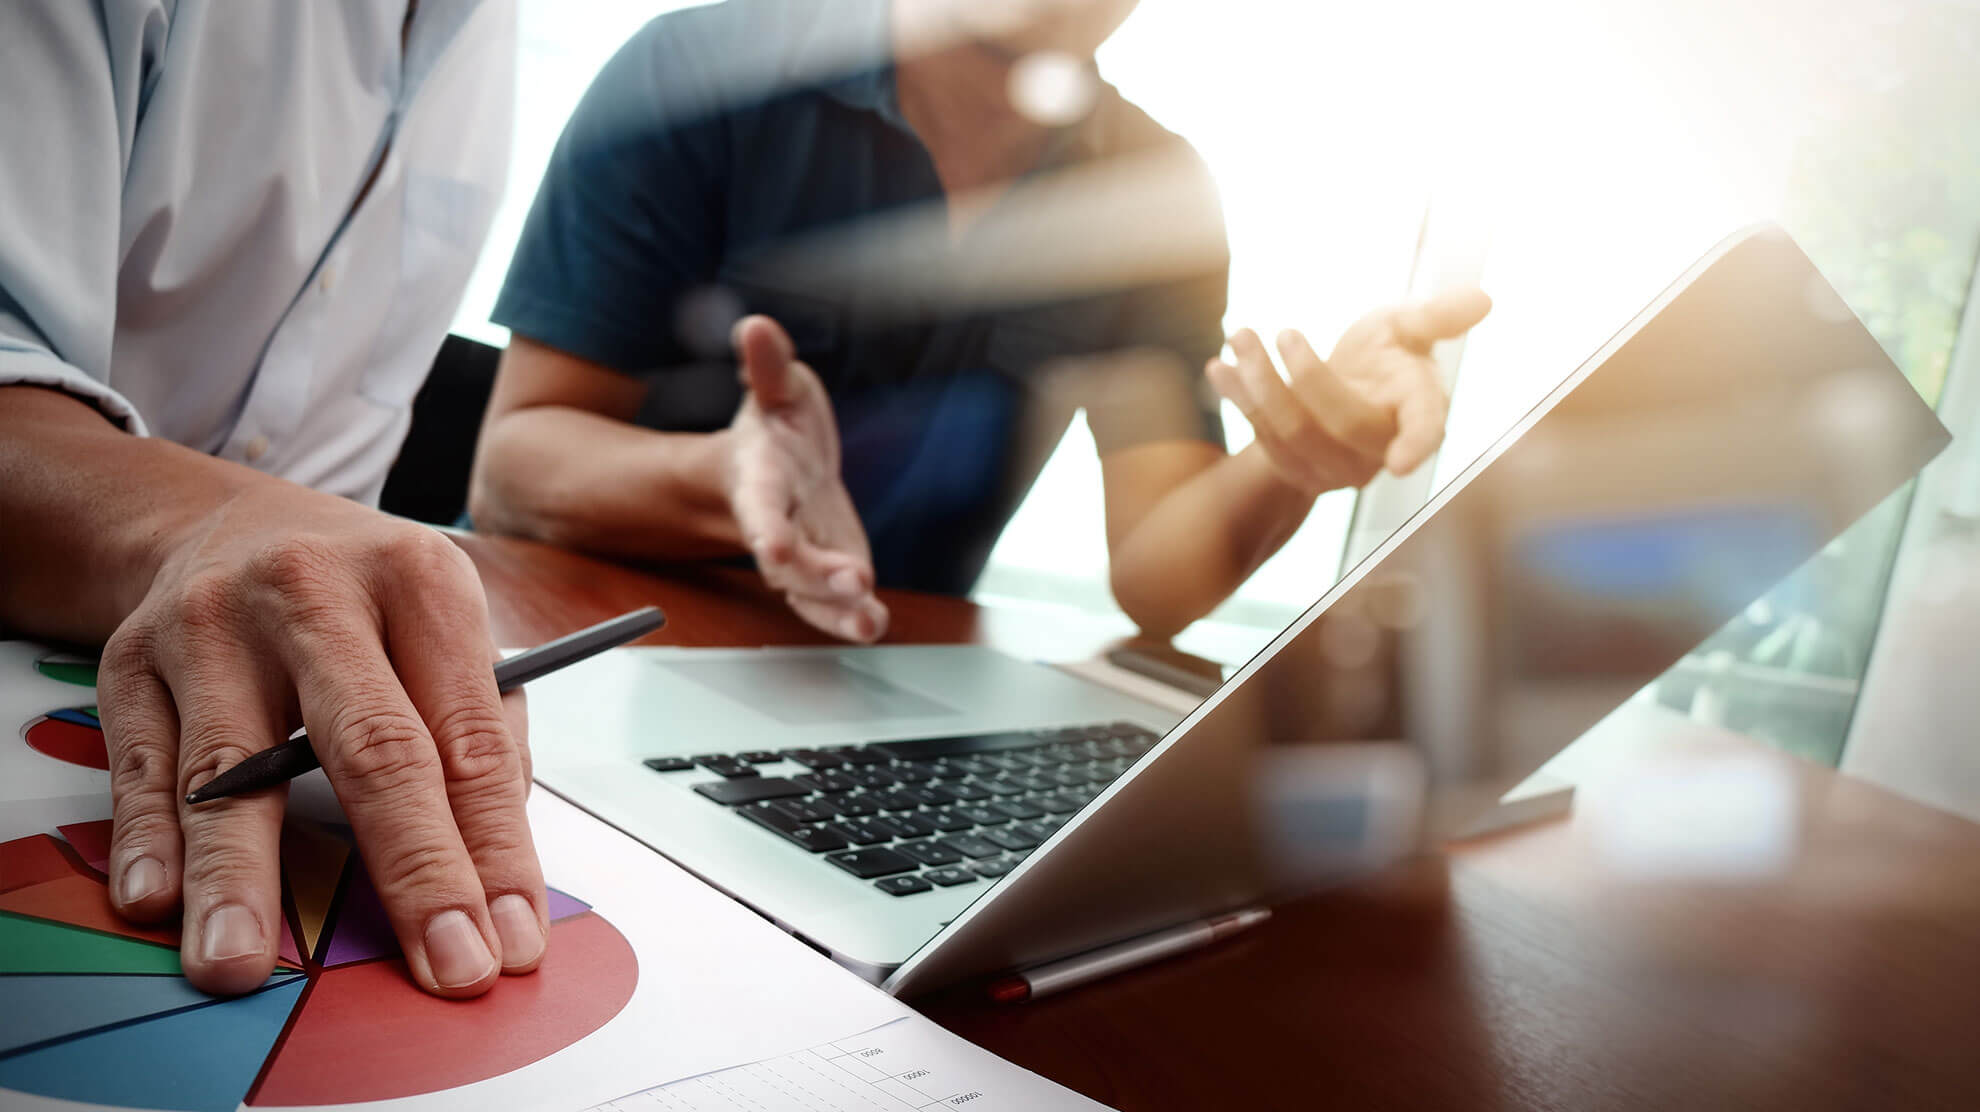 Eine Schulung in WordPress bei der Agentur punktneun-Webdesignn